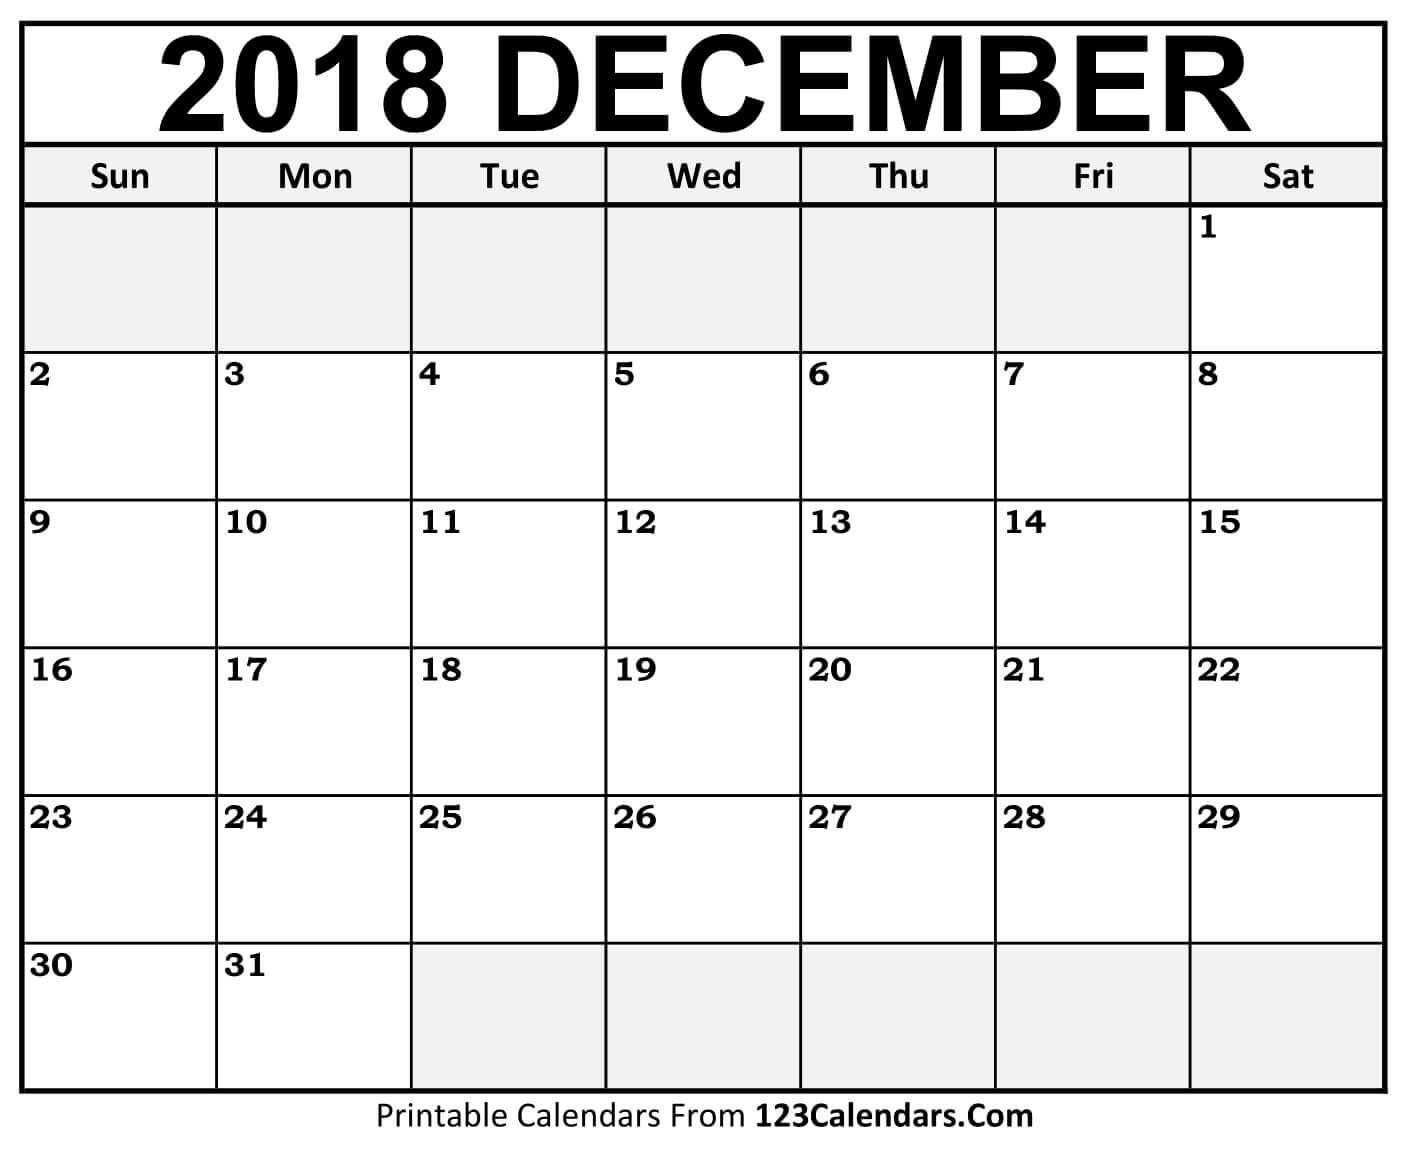 December 2018 Activity Calenda